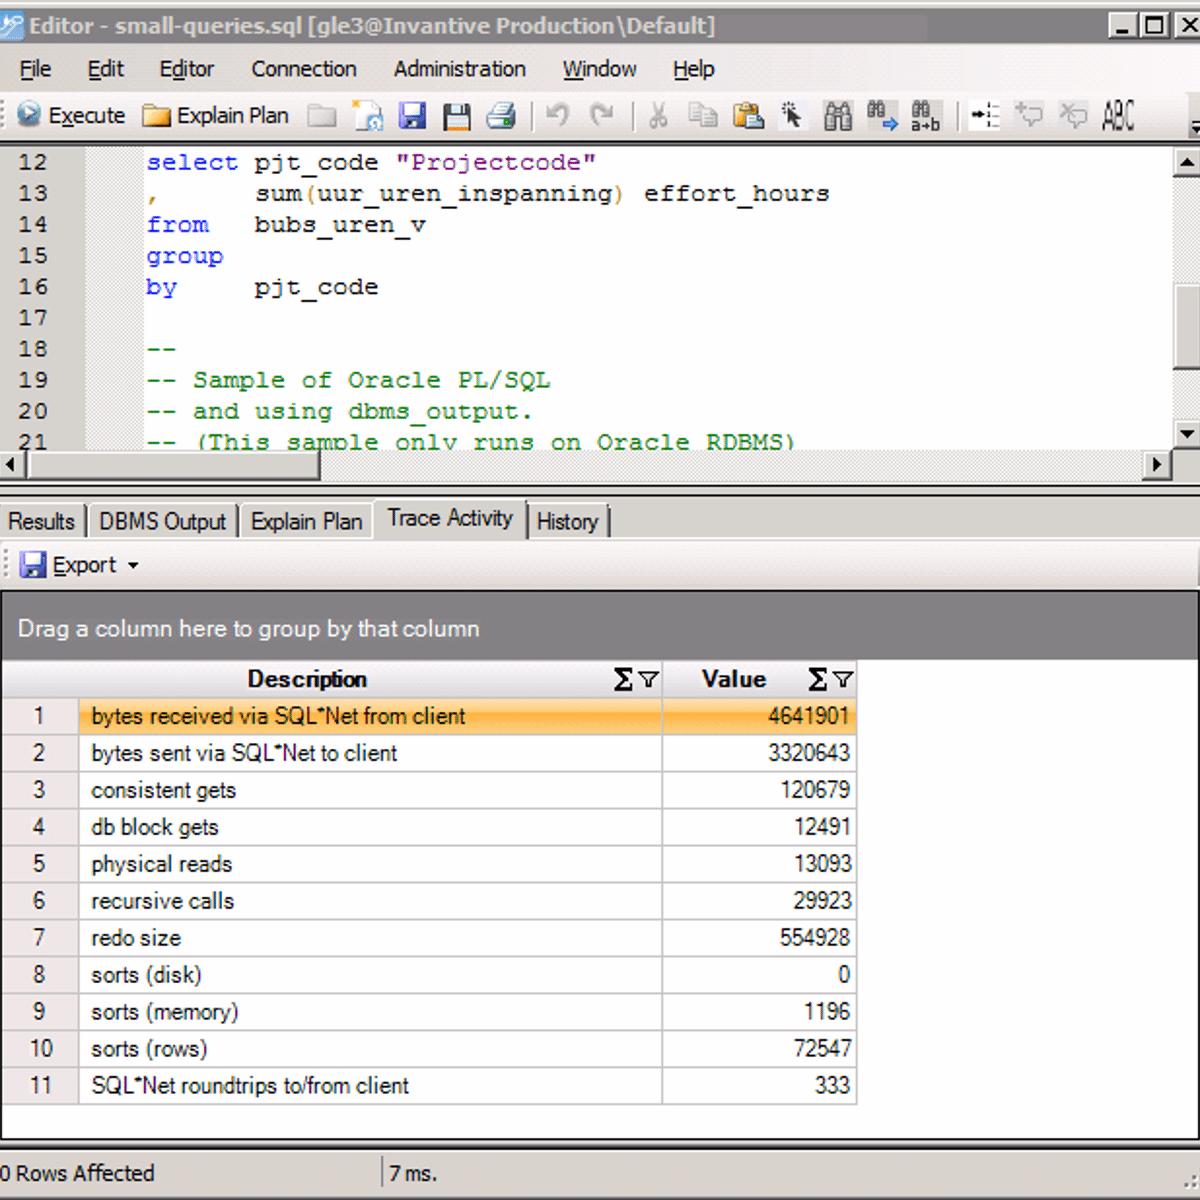 Invantive Query Tool Alternatives and Similar Software